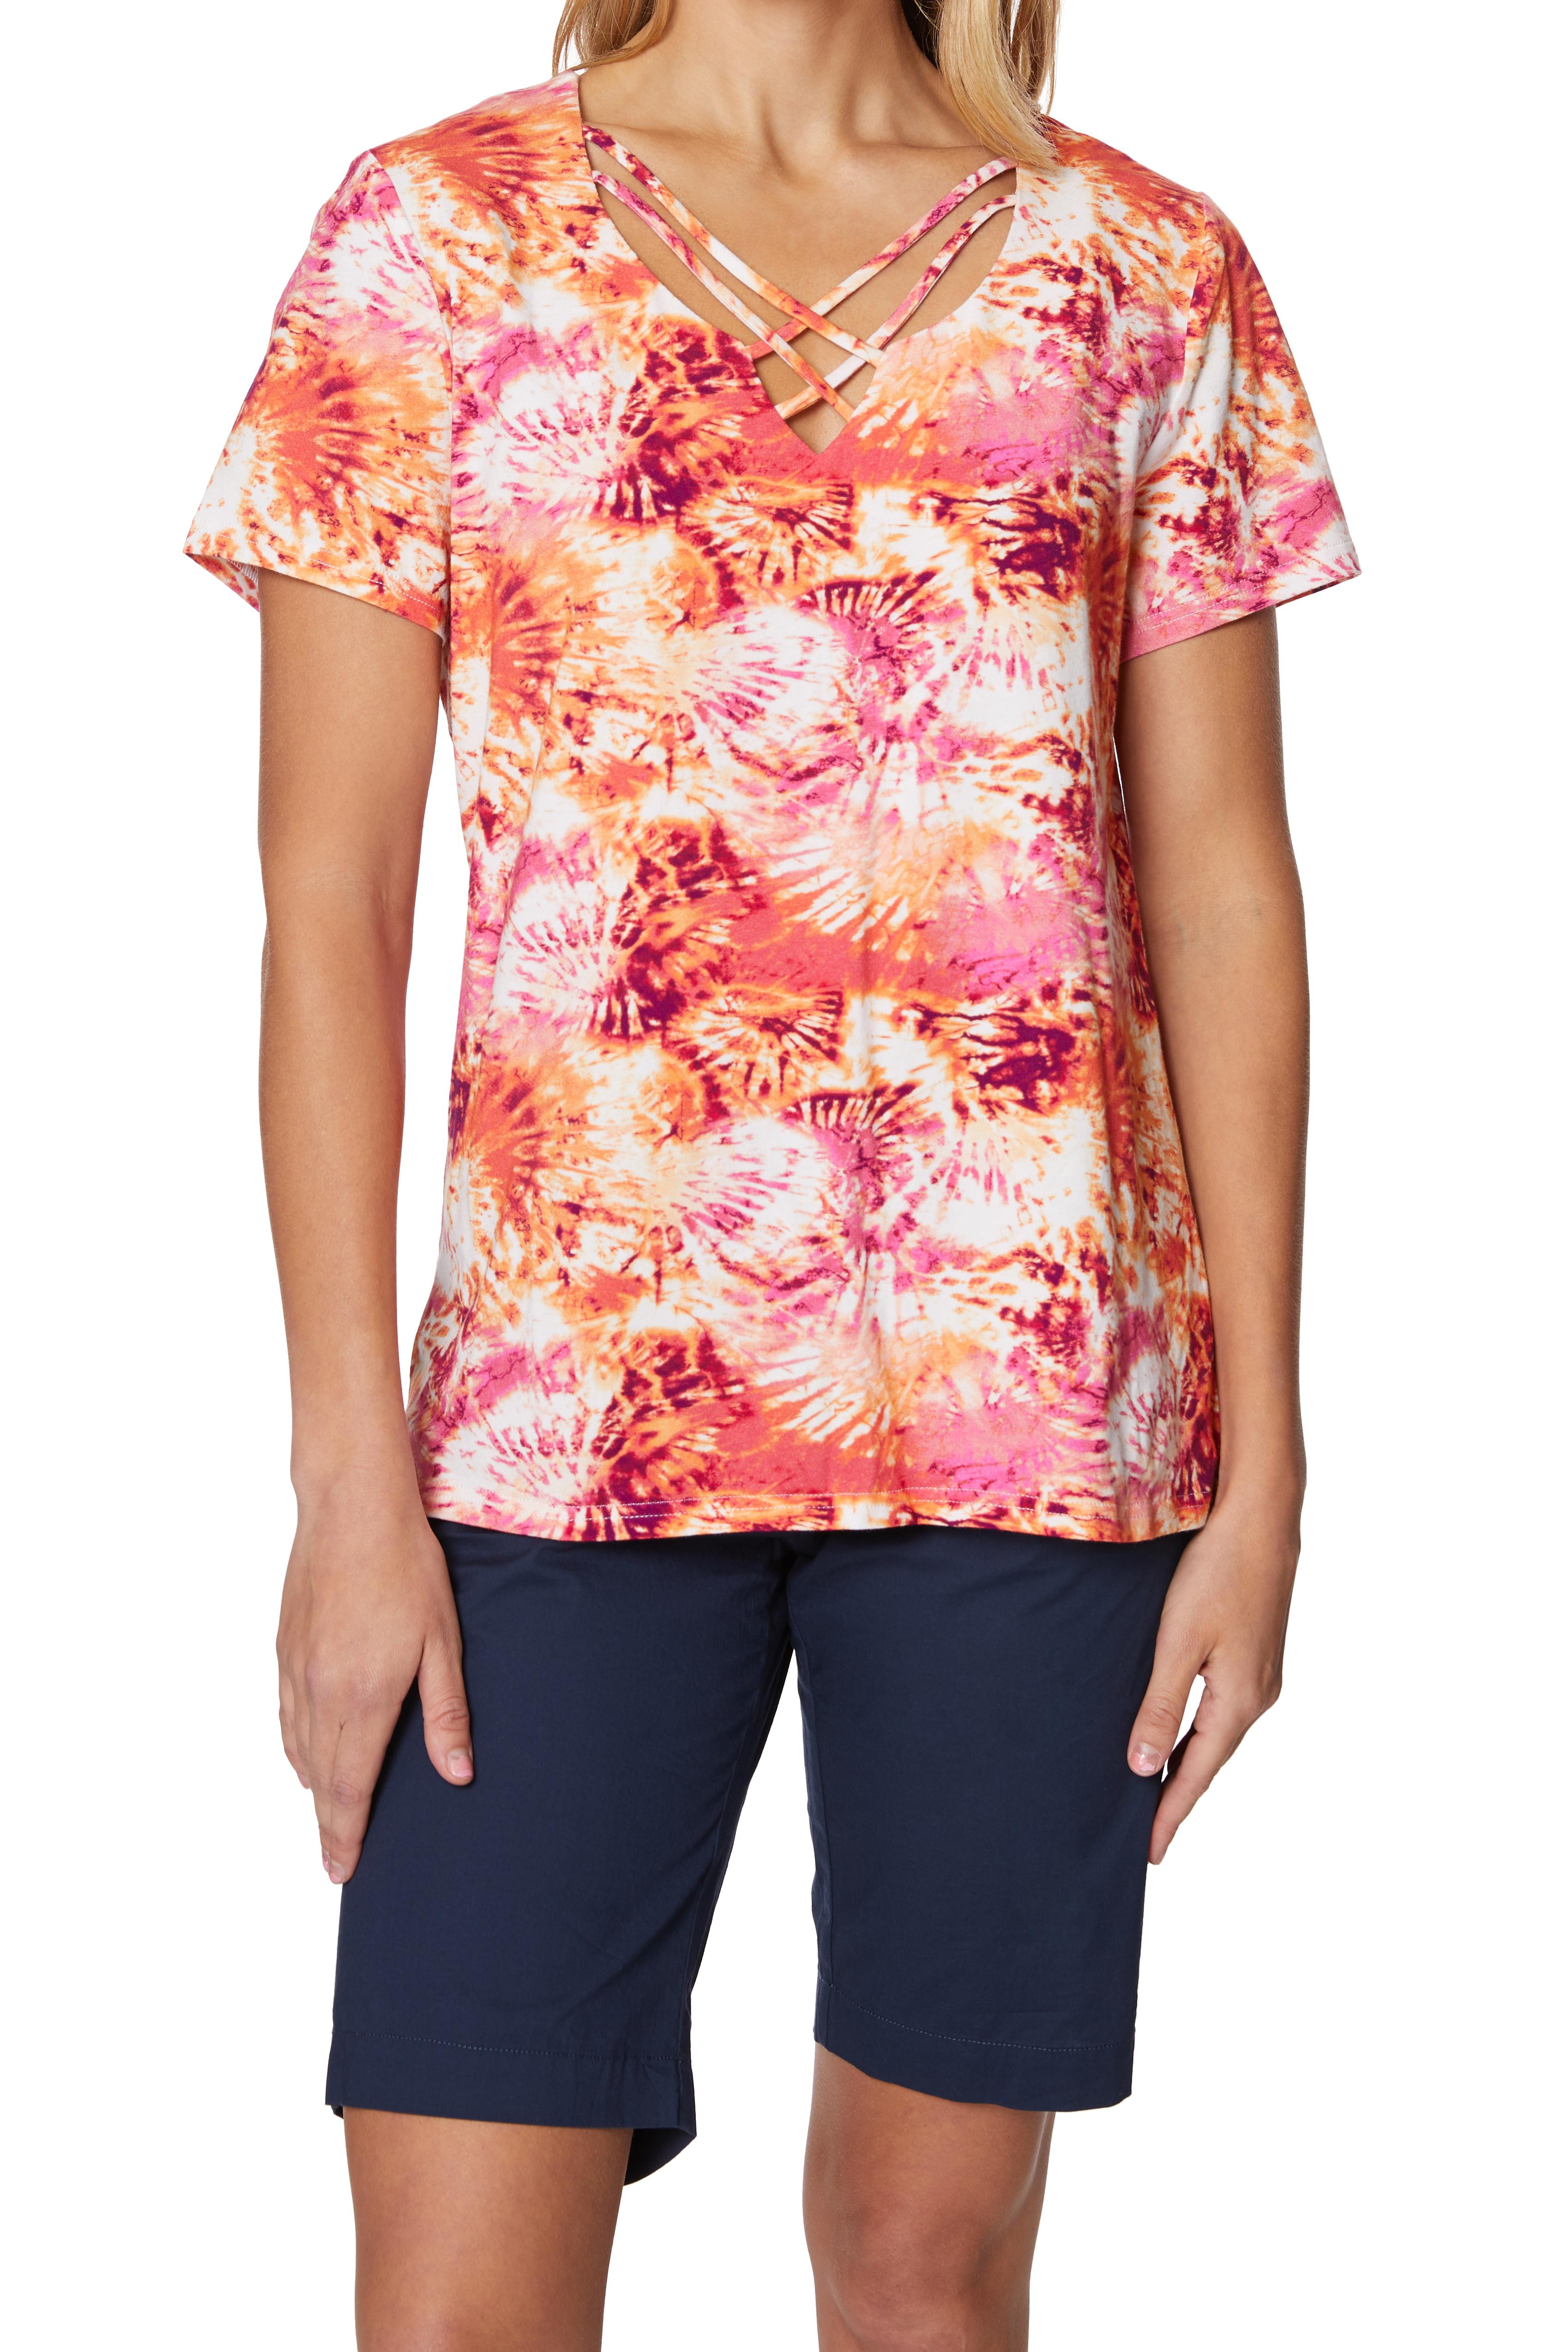 Caribbean Joe® Criss Cross Knit Top -Sundried - Front